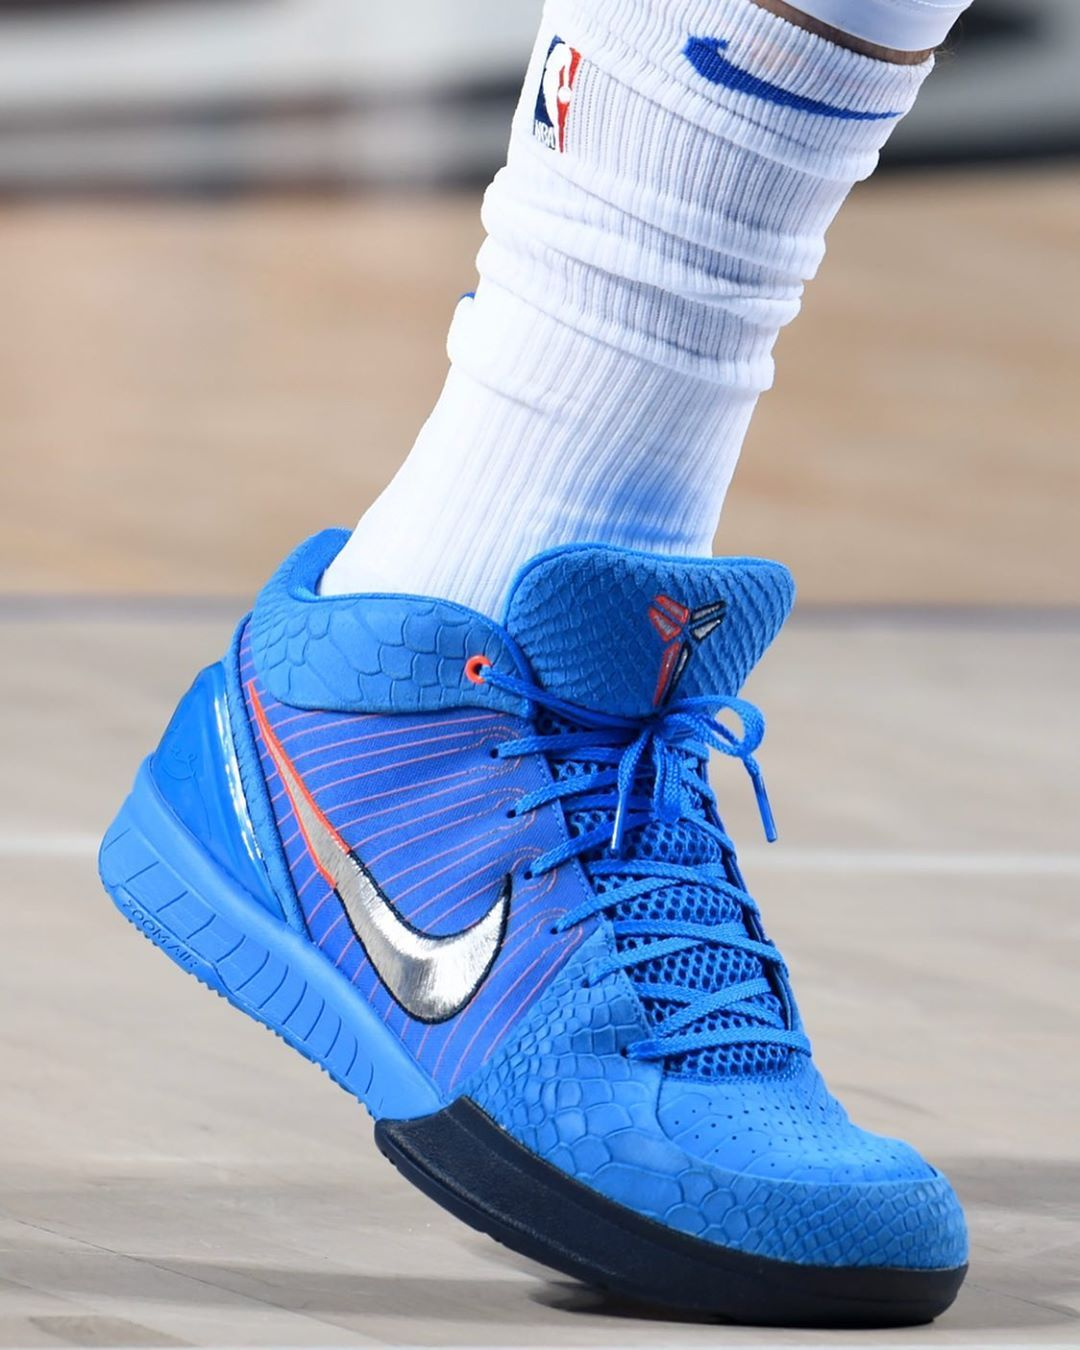 Sneakers nike, Air max sneakers, Nike